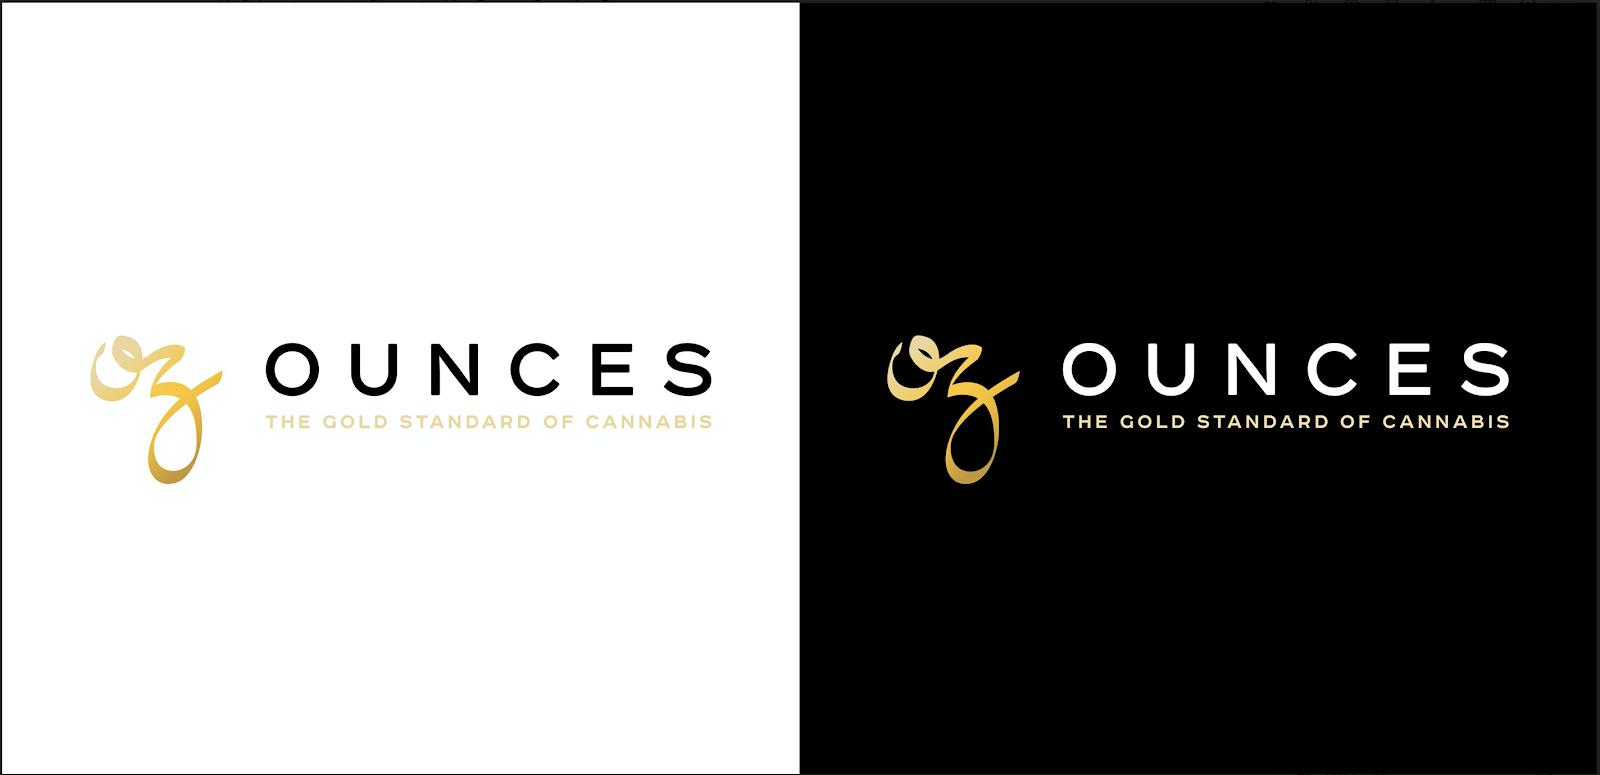 Ounces - High Road Design Studio